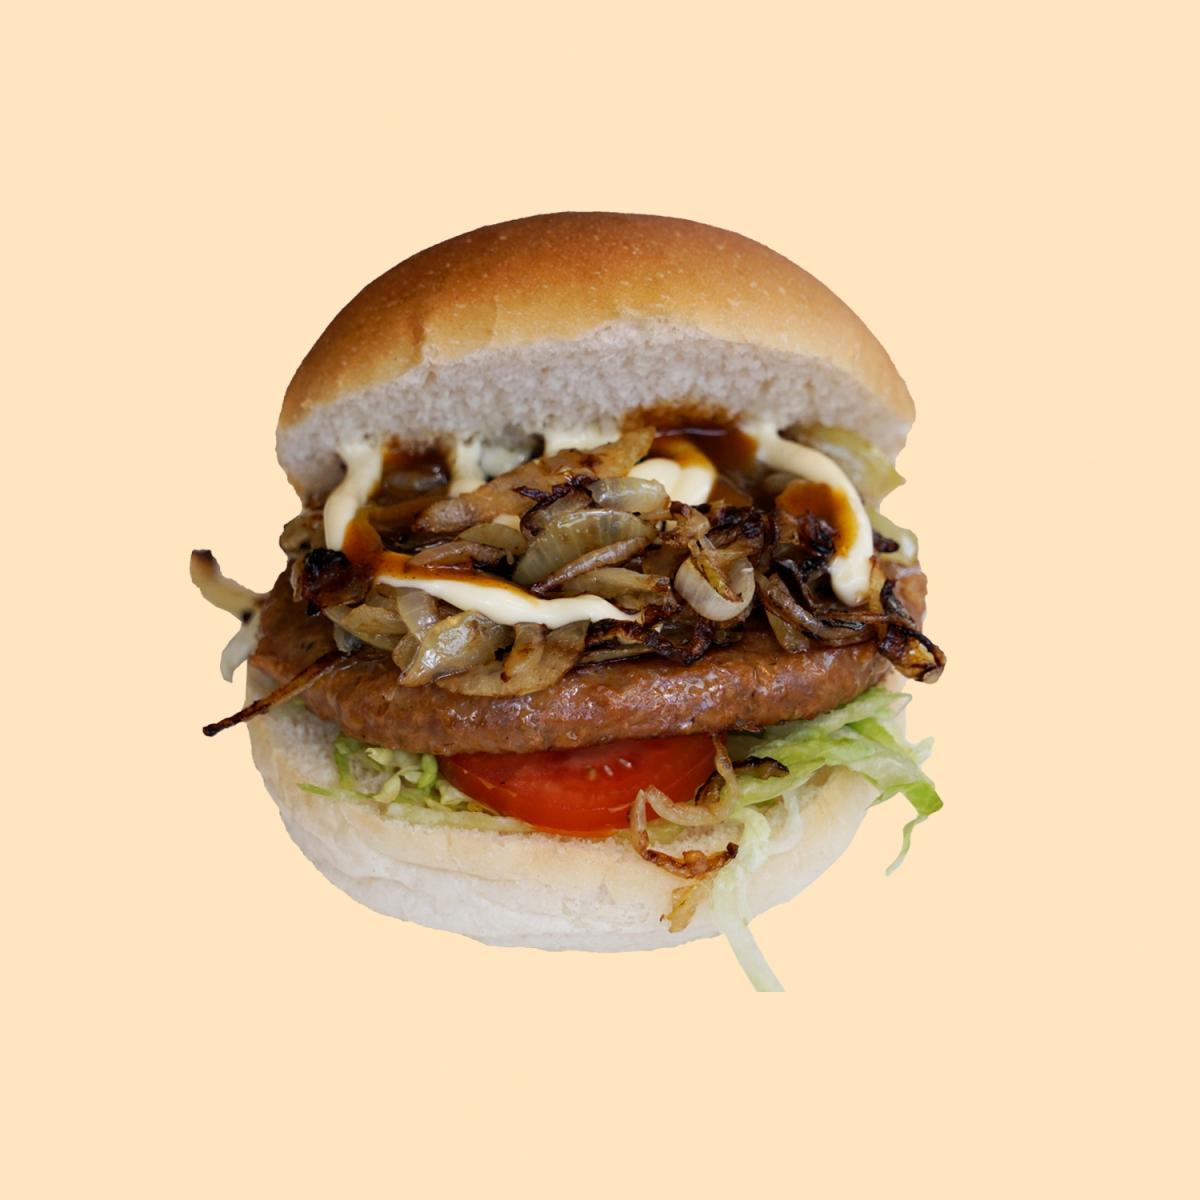 Broodje hamburger speciaal